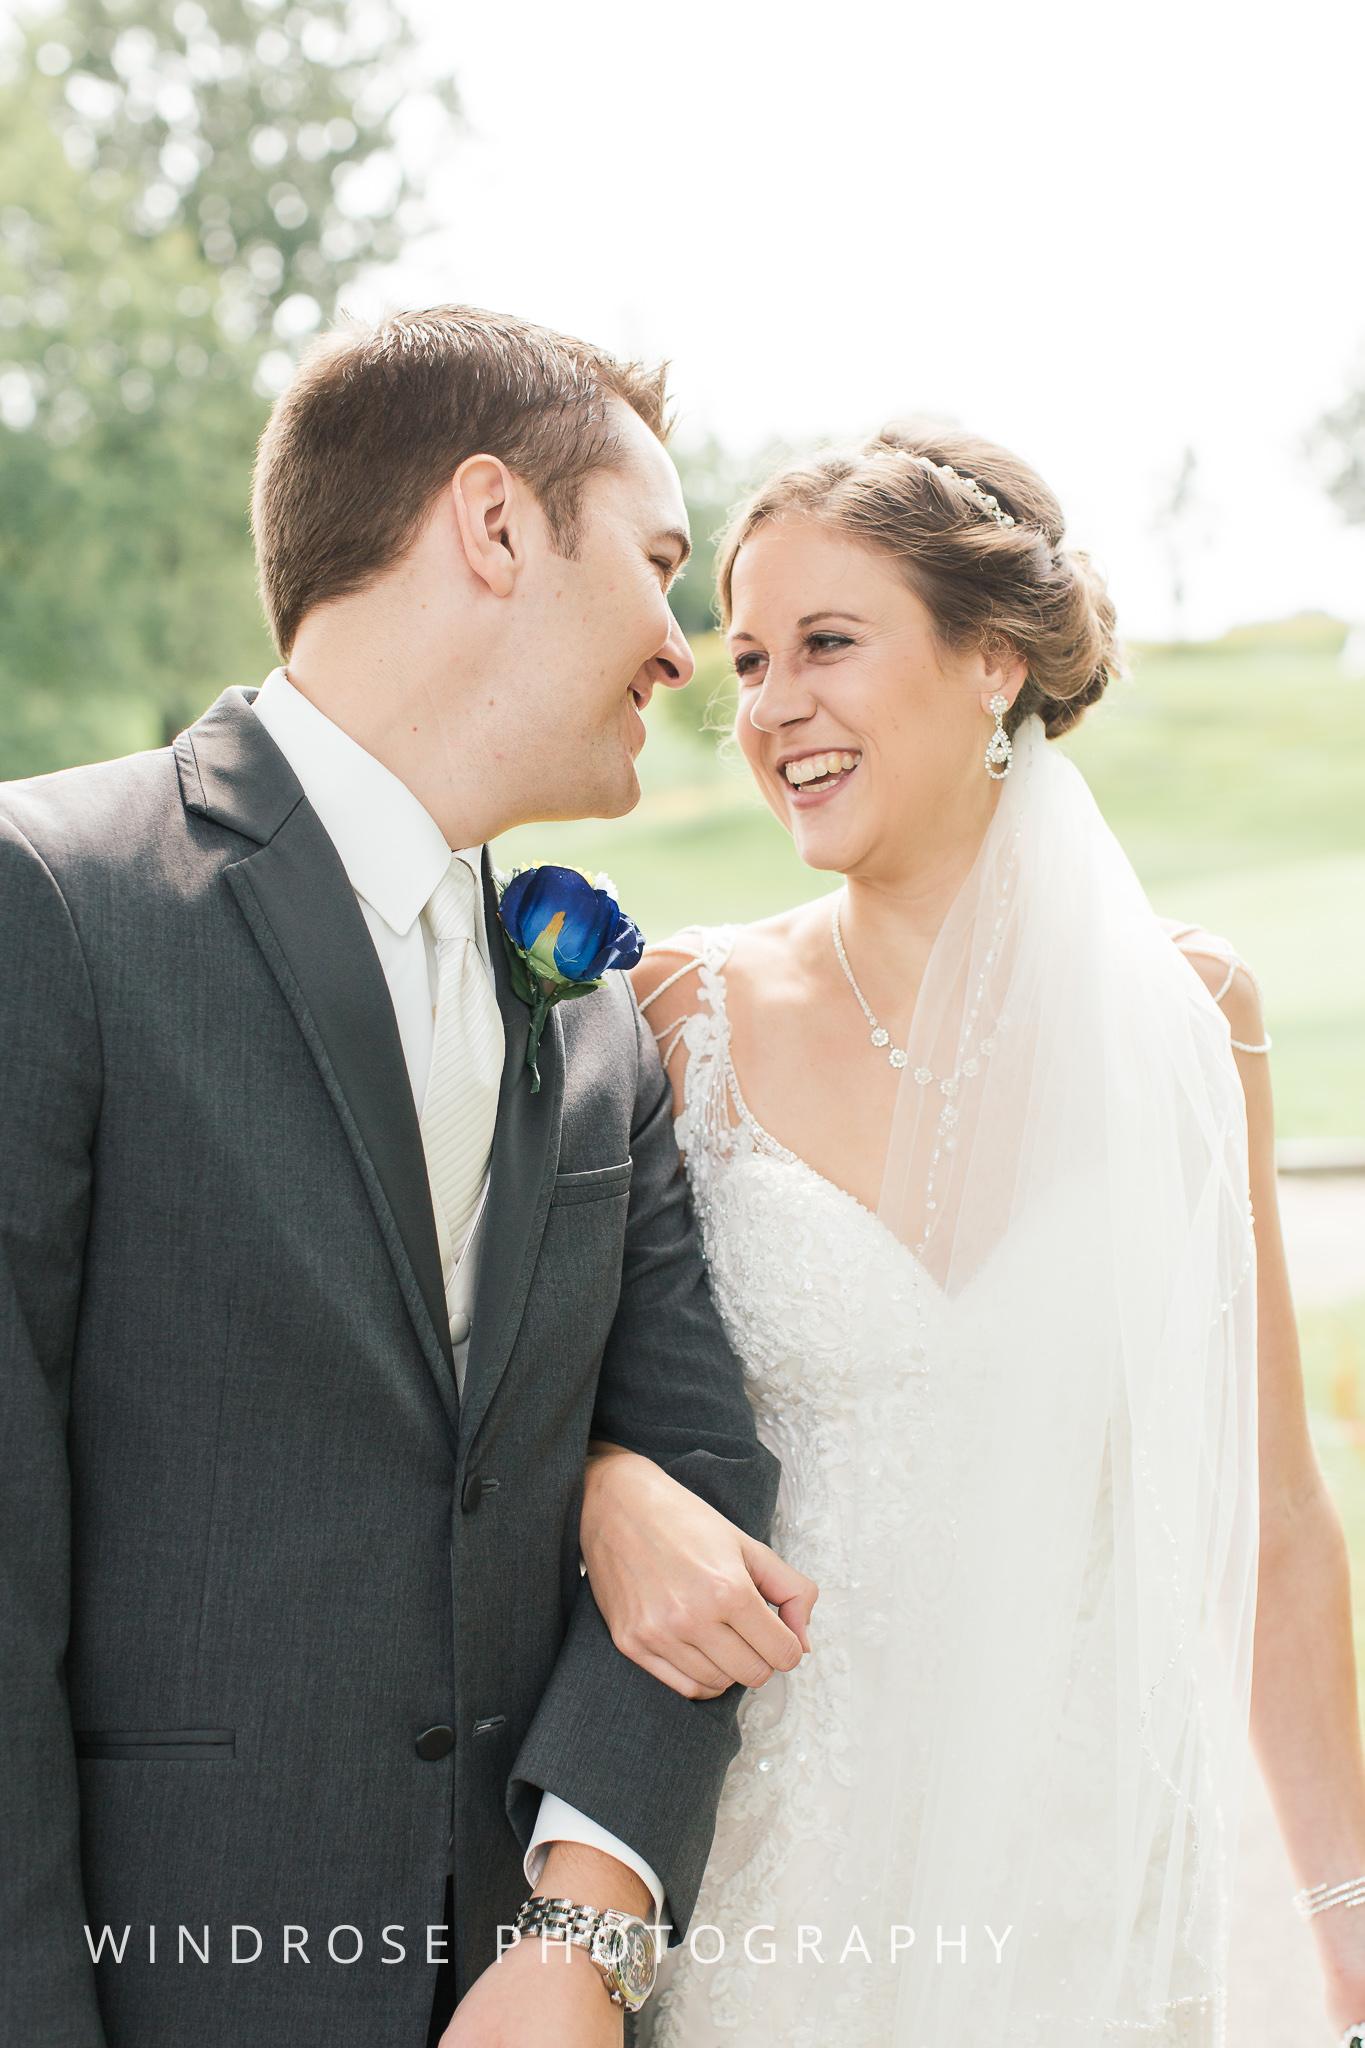 La-Crosse-Country-Club-Wedding-Minnesota-Wedding-Photographer-9.jpg